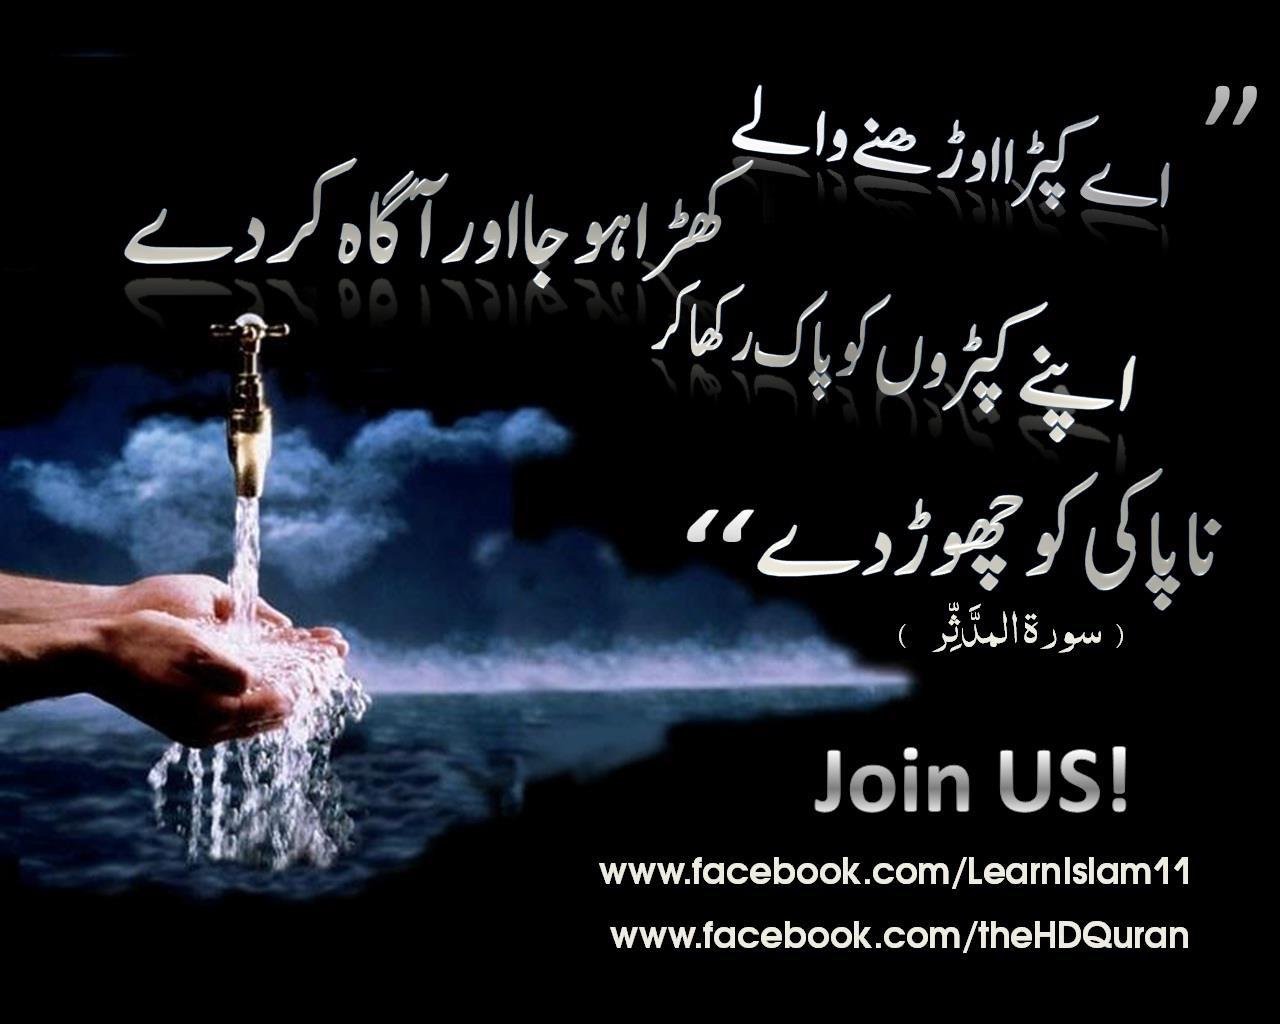 The hd urdu quran and learn islam 11 islamic wallpapers - Wallpaper urdu poetry islamic ...